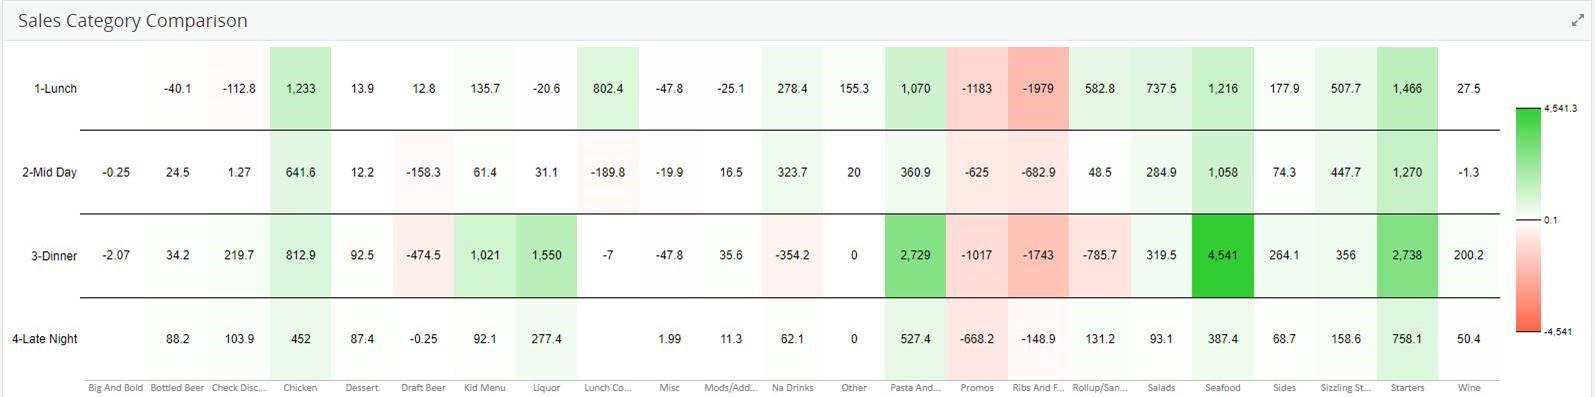 IA Sales Category Comparison